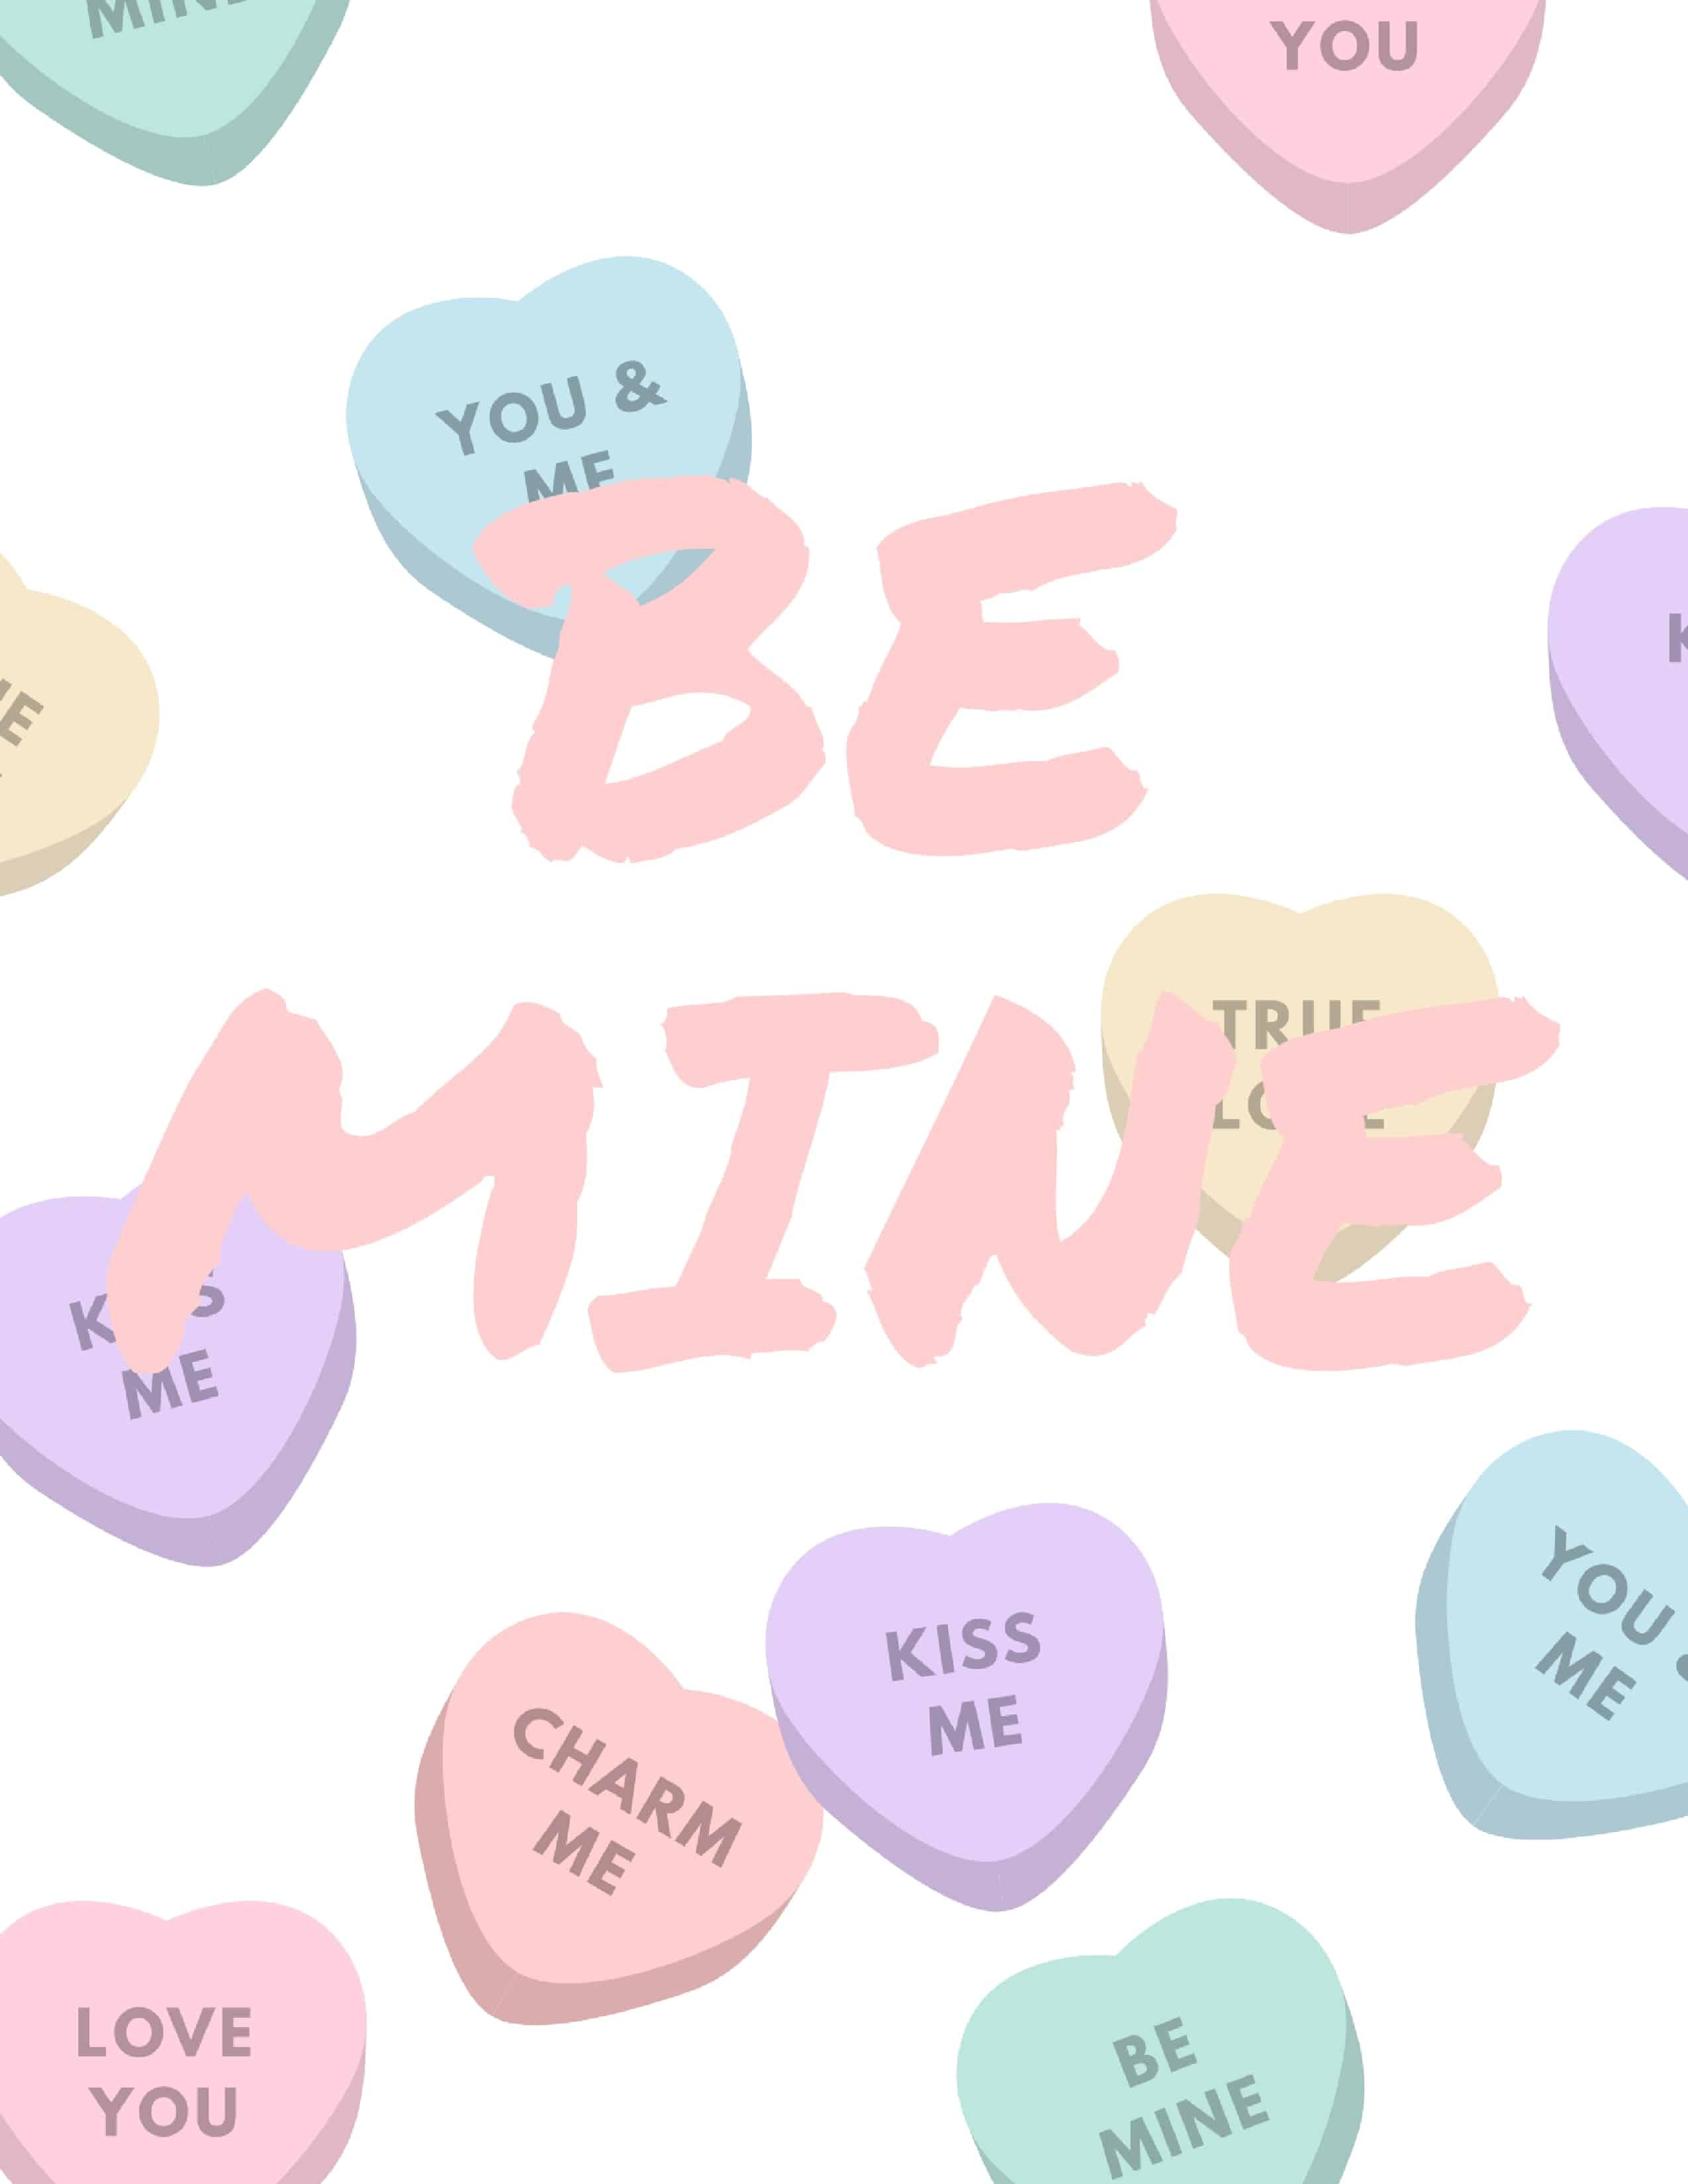 Free Valentines Day Printables - www.arinsolangeathome.com